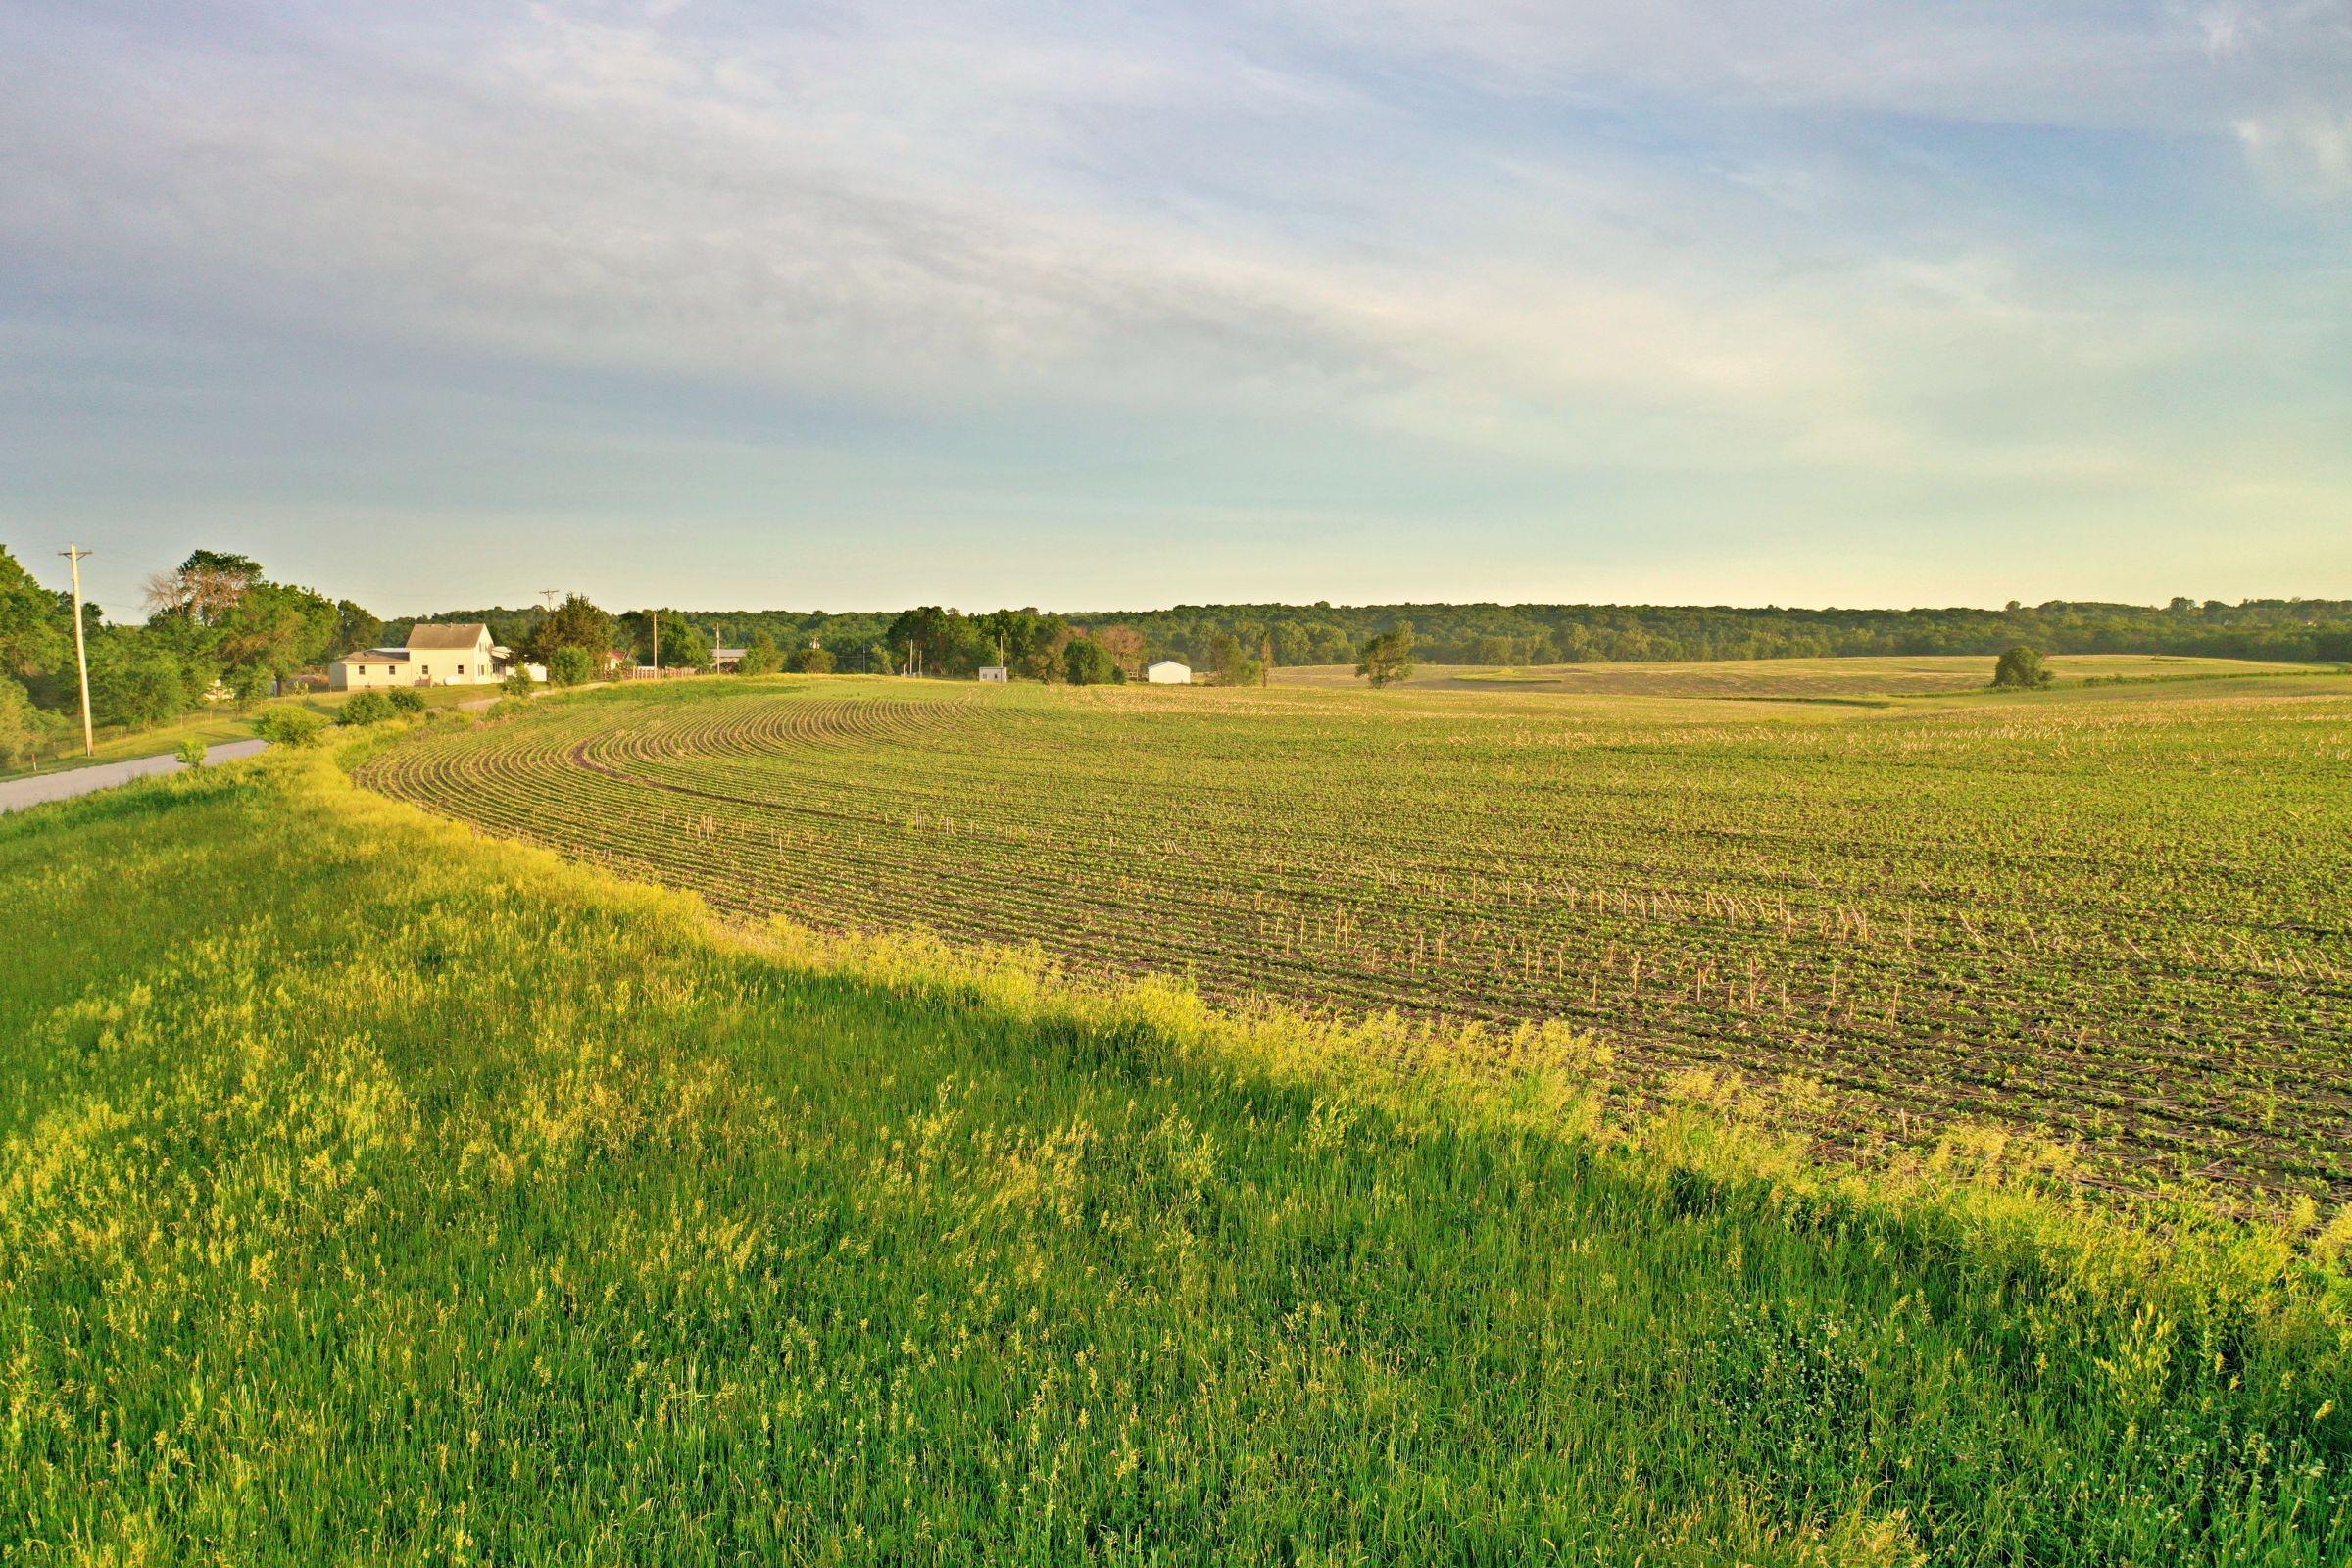 development-land-warren-county-iowa-20-acres-listing-number-15424-2-2021-03-25-201256.JPG